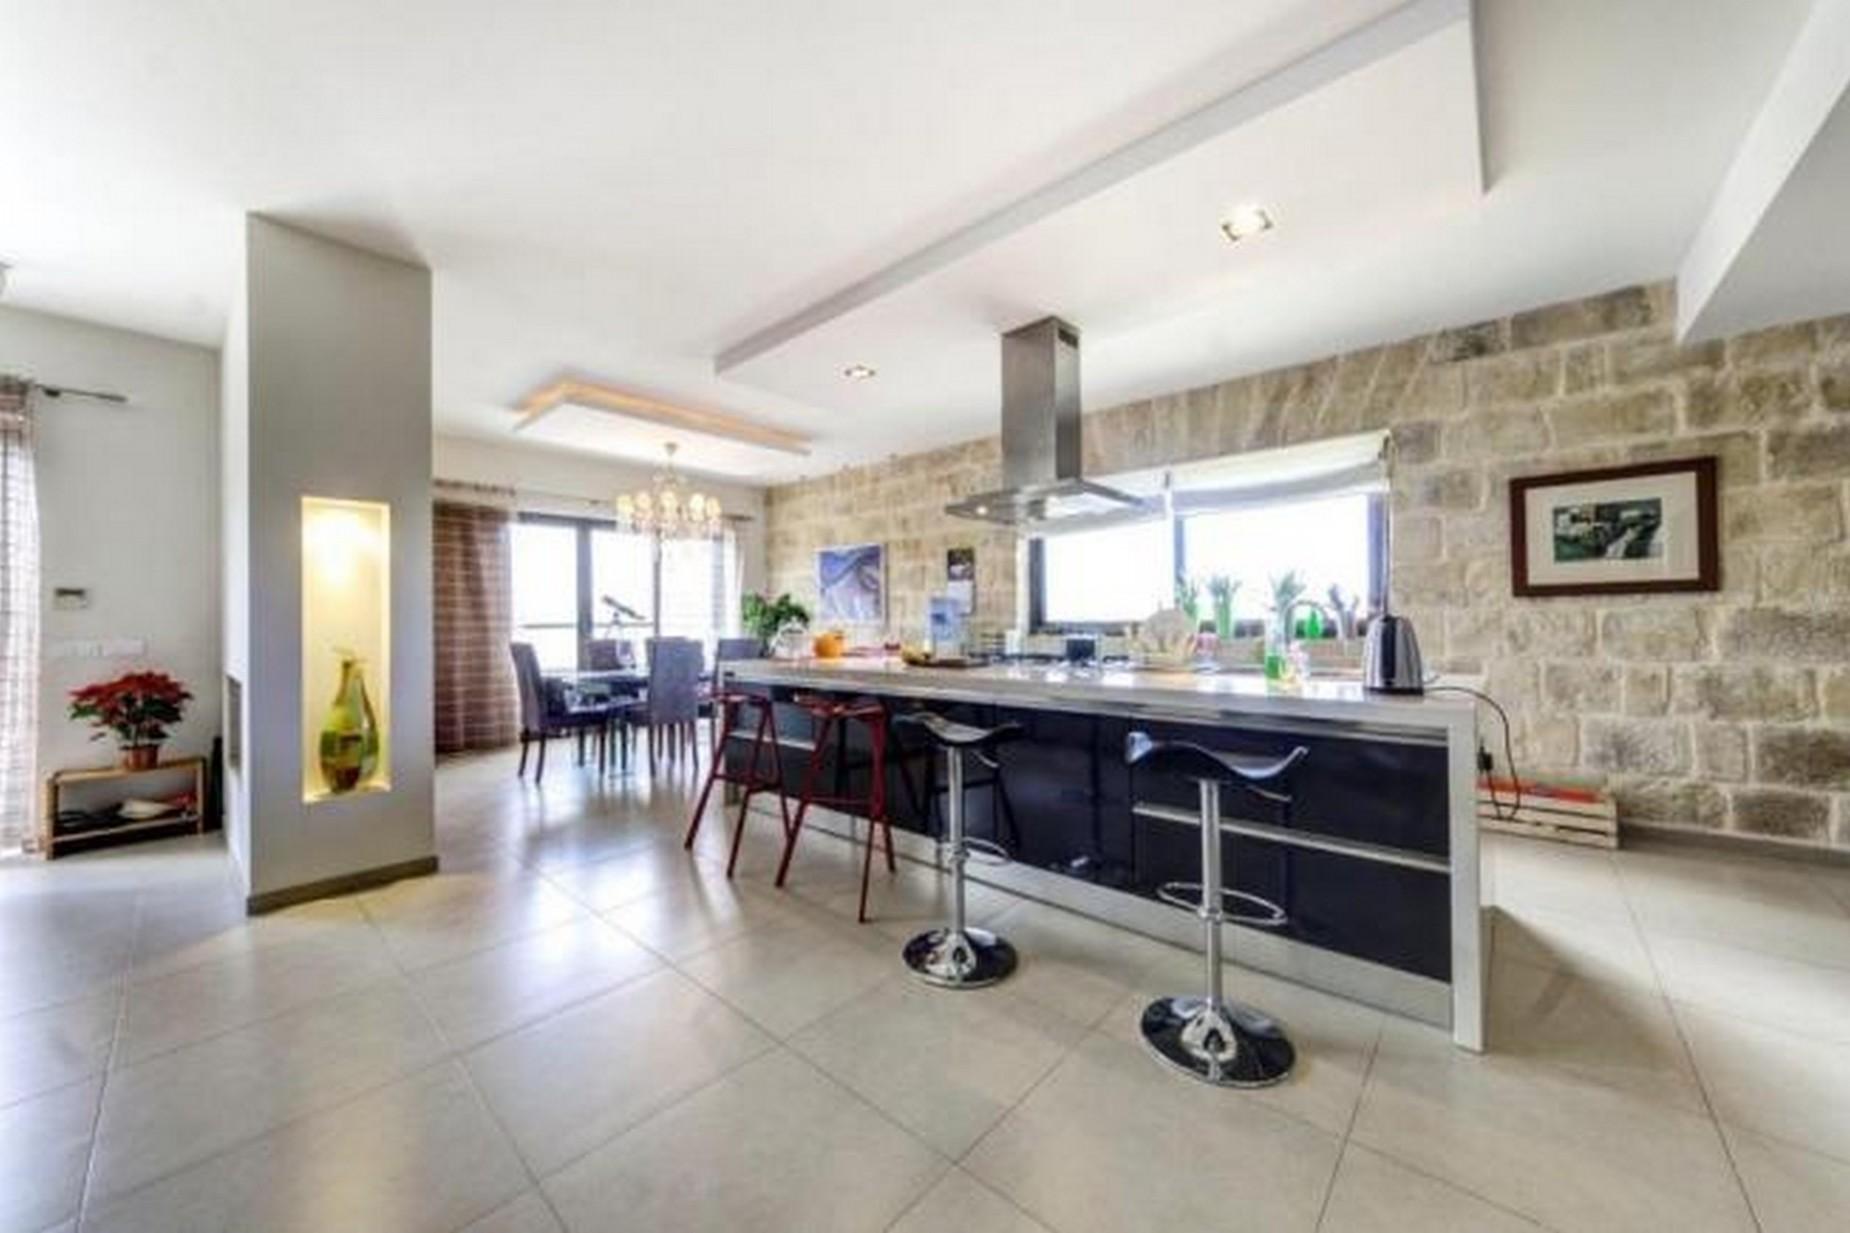 4 bed Villa For Rent in Marsascala, Marsascala - thumb 7